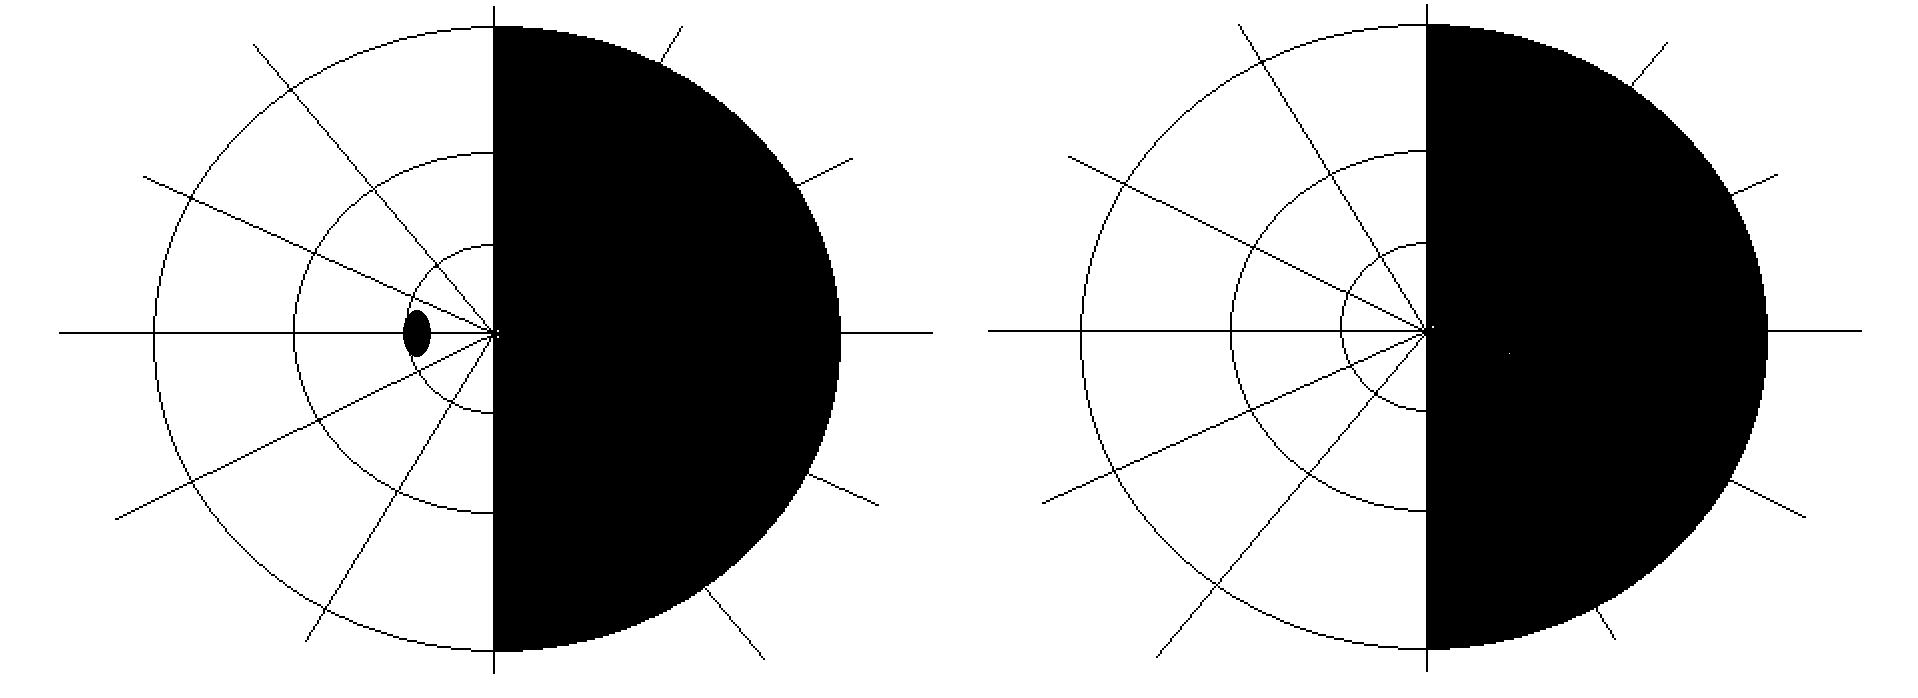 File:Visual field homonymous hemianopia.png - Wikimedia ...